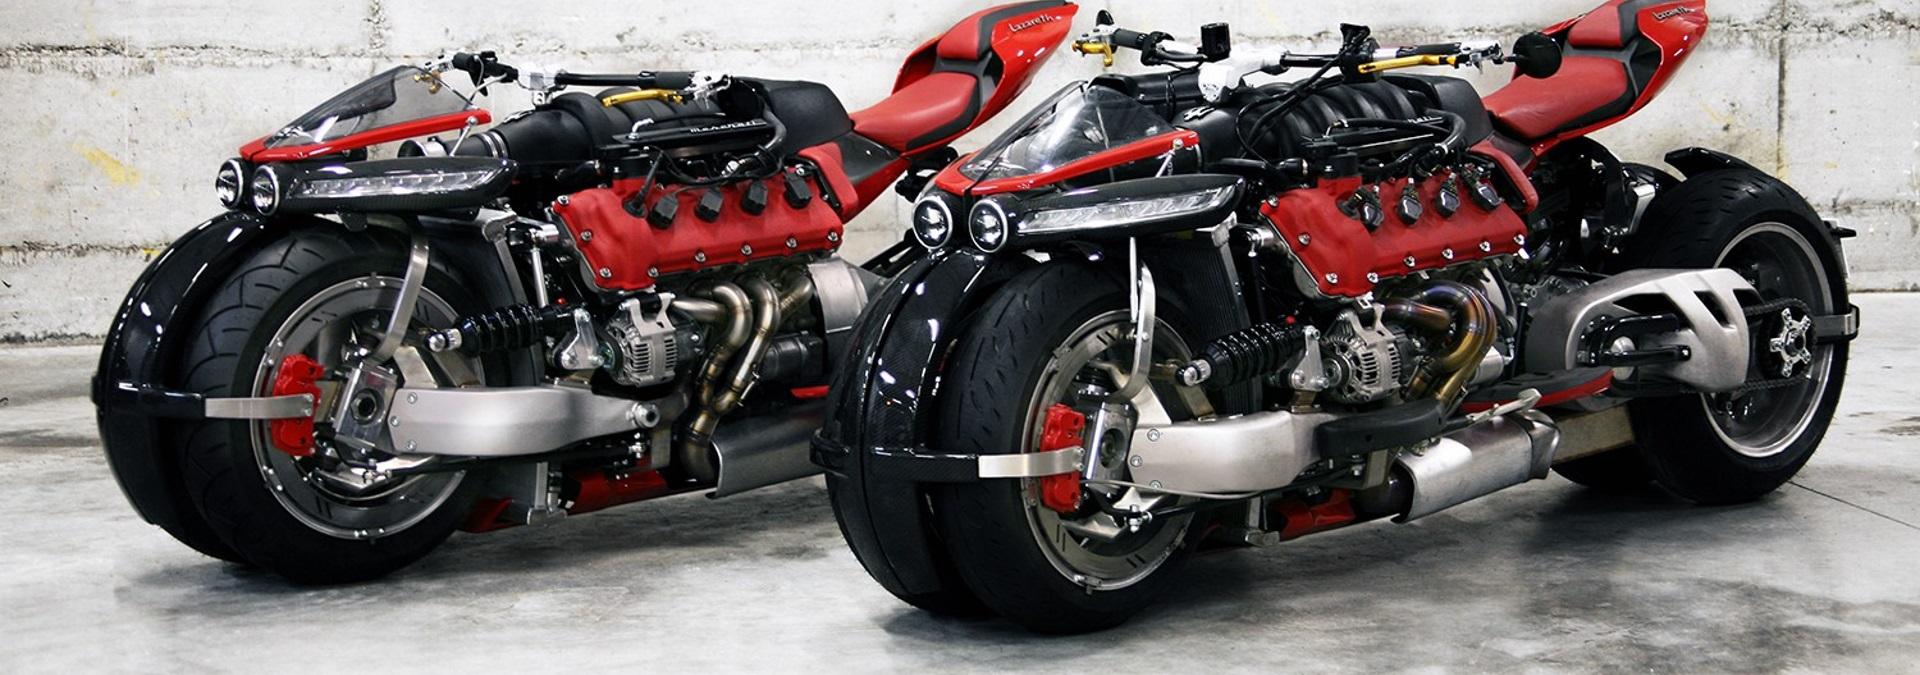 Moto 1920